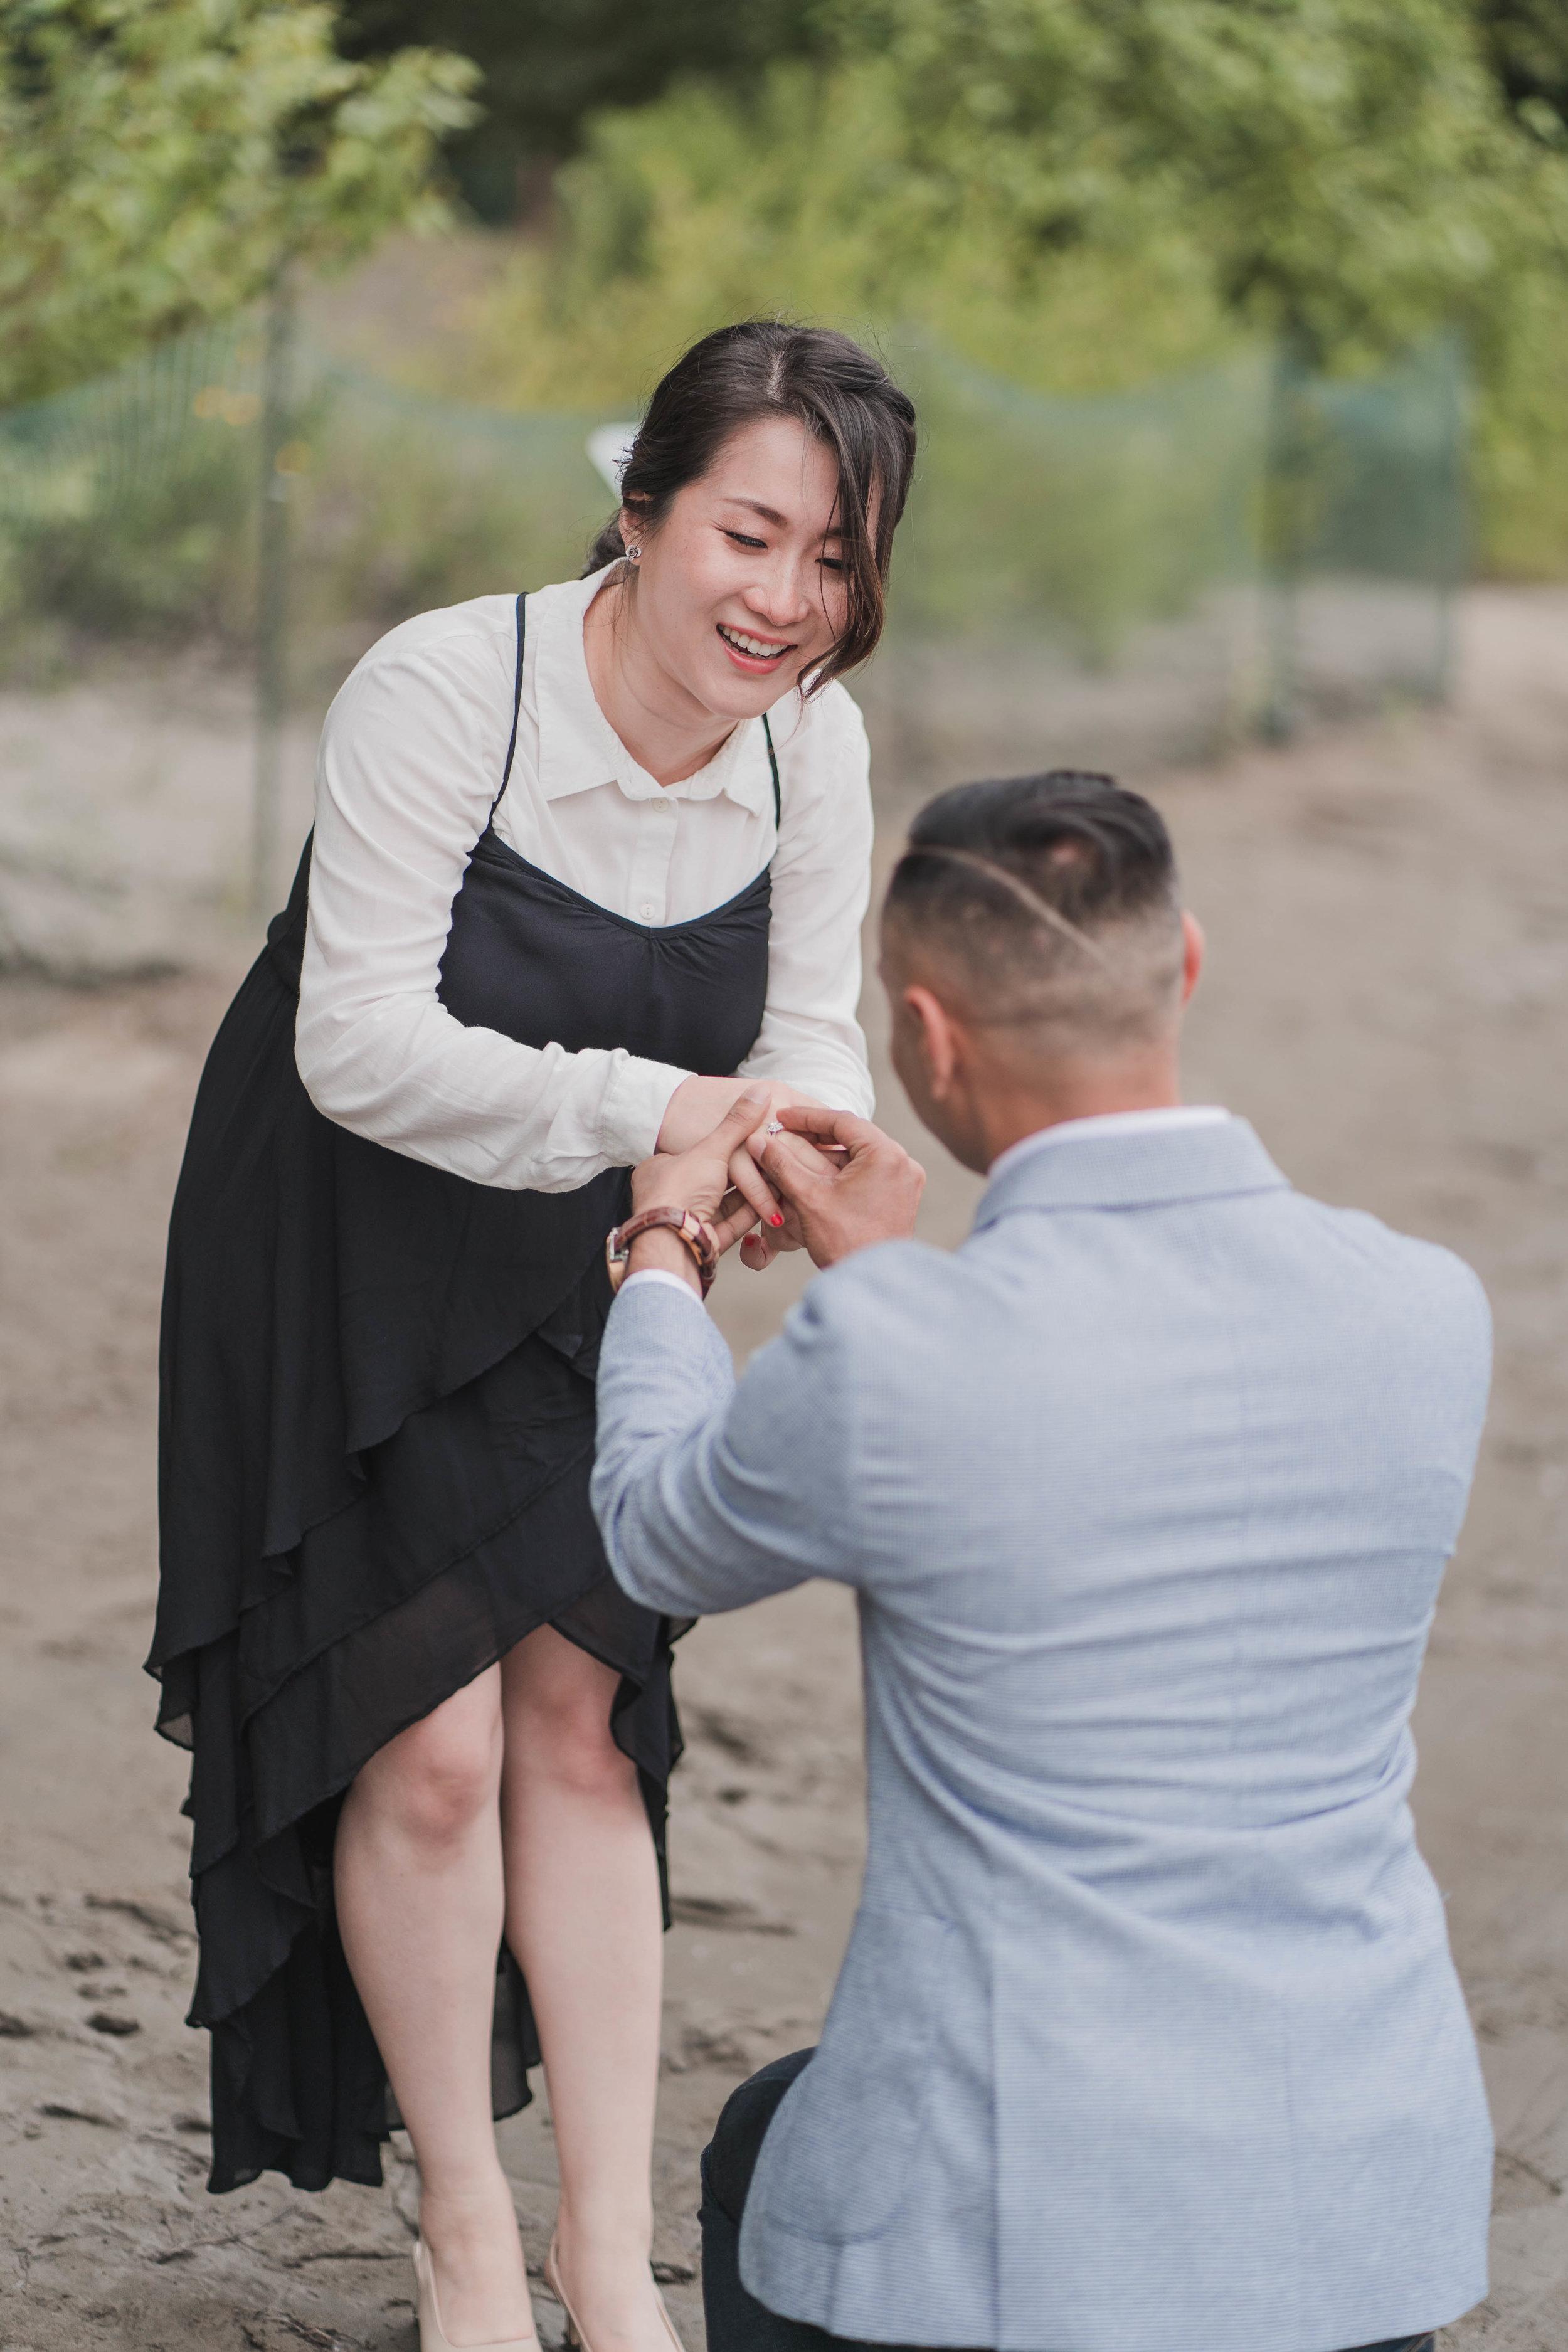 20190622 - Monika & Johnson Engagement - 0140.jpg